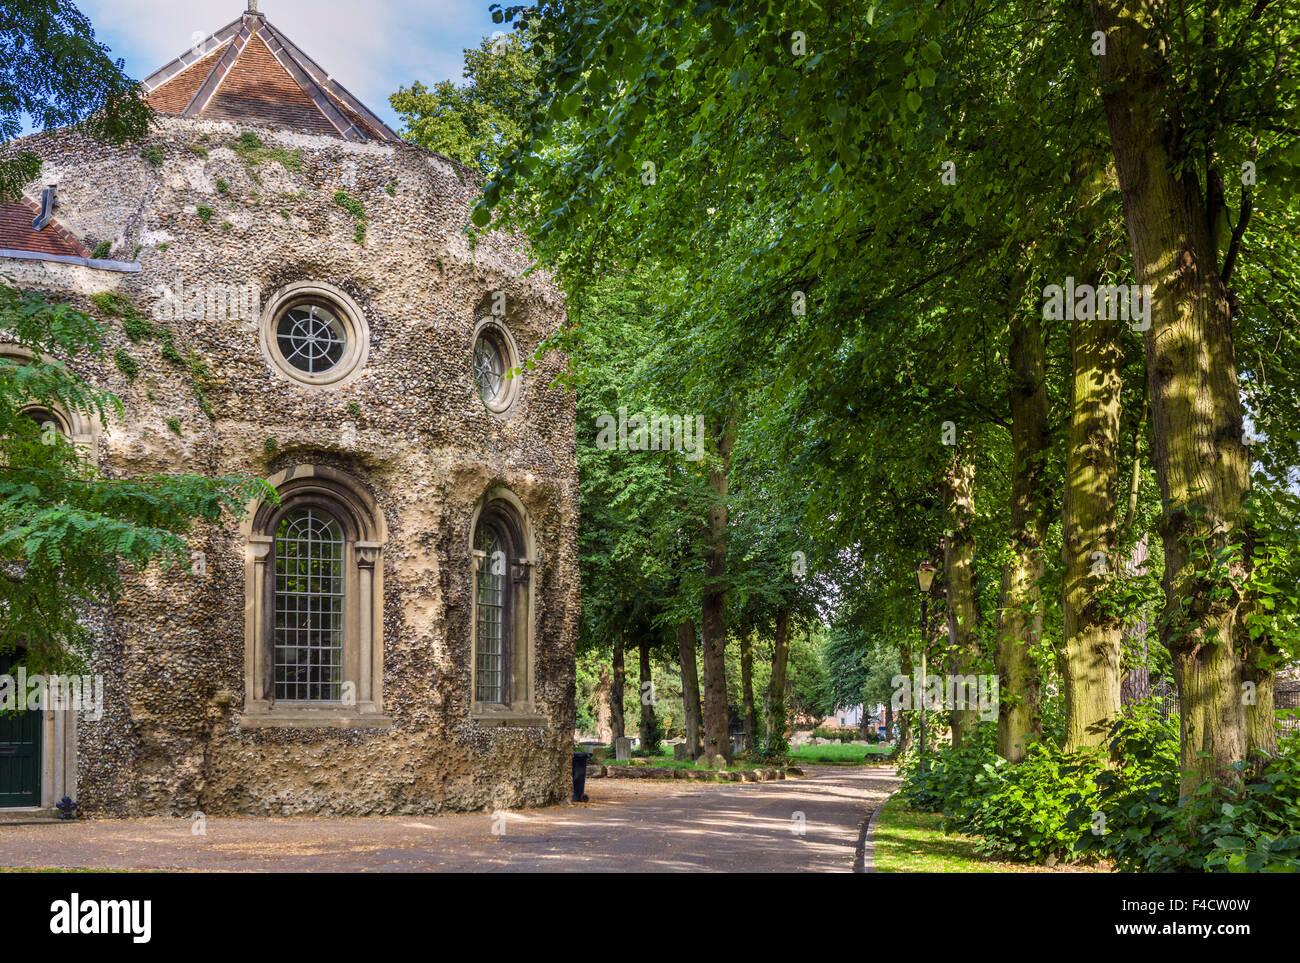 The grounds of Bury St Edmunds Abbey and St Edmundsbury Cathedral, Bury St Edmunds, Suffolk, England, UK - Stock Image